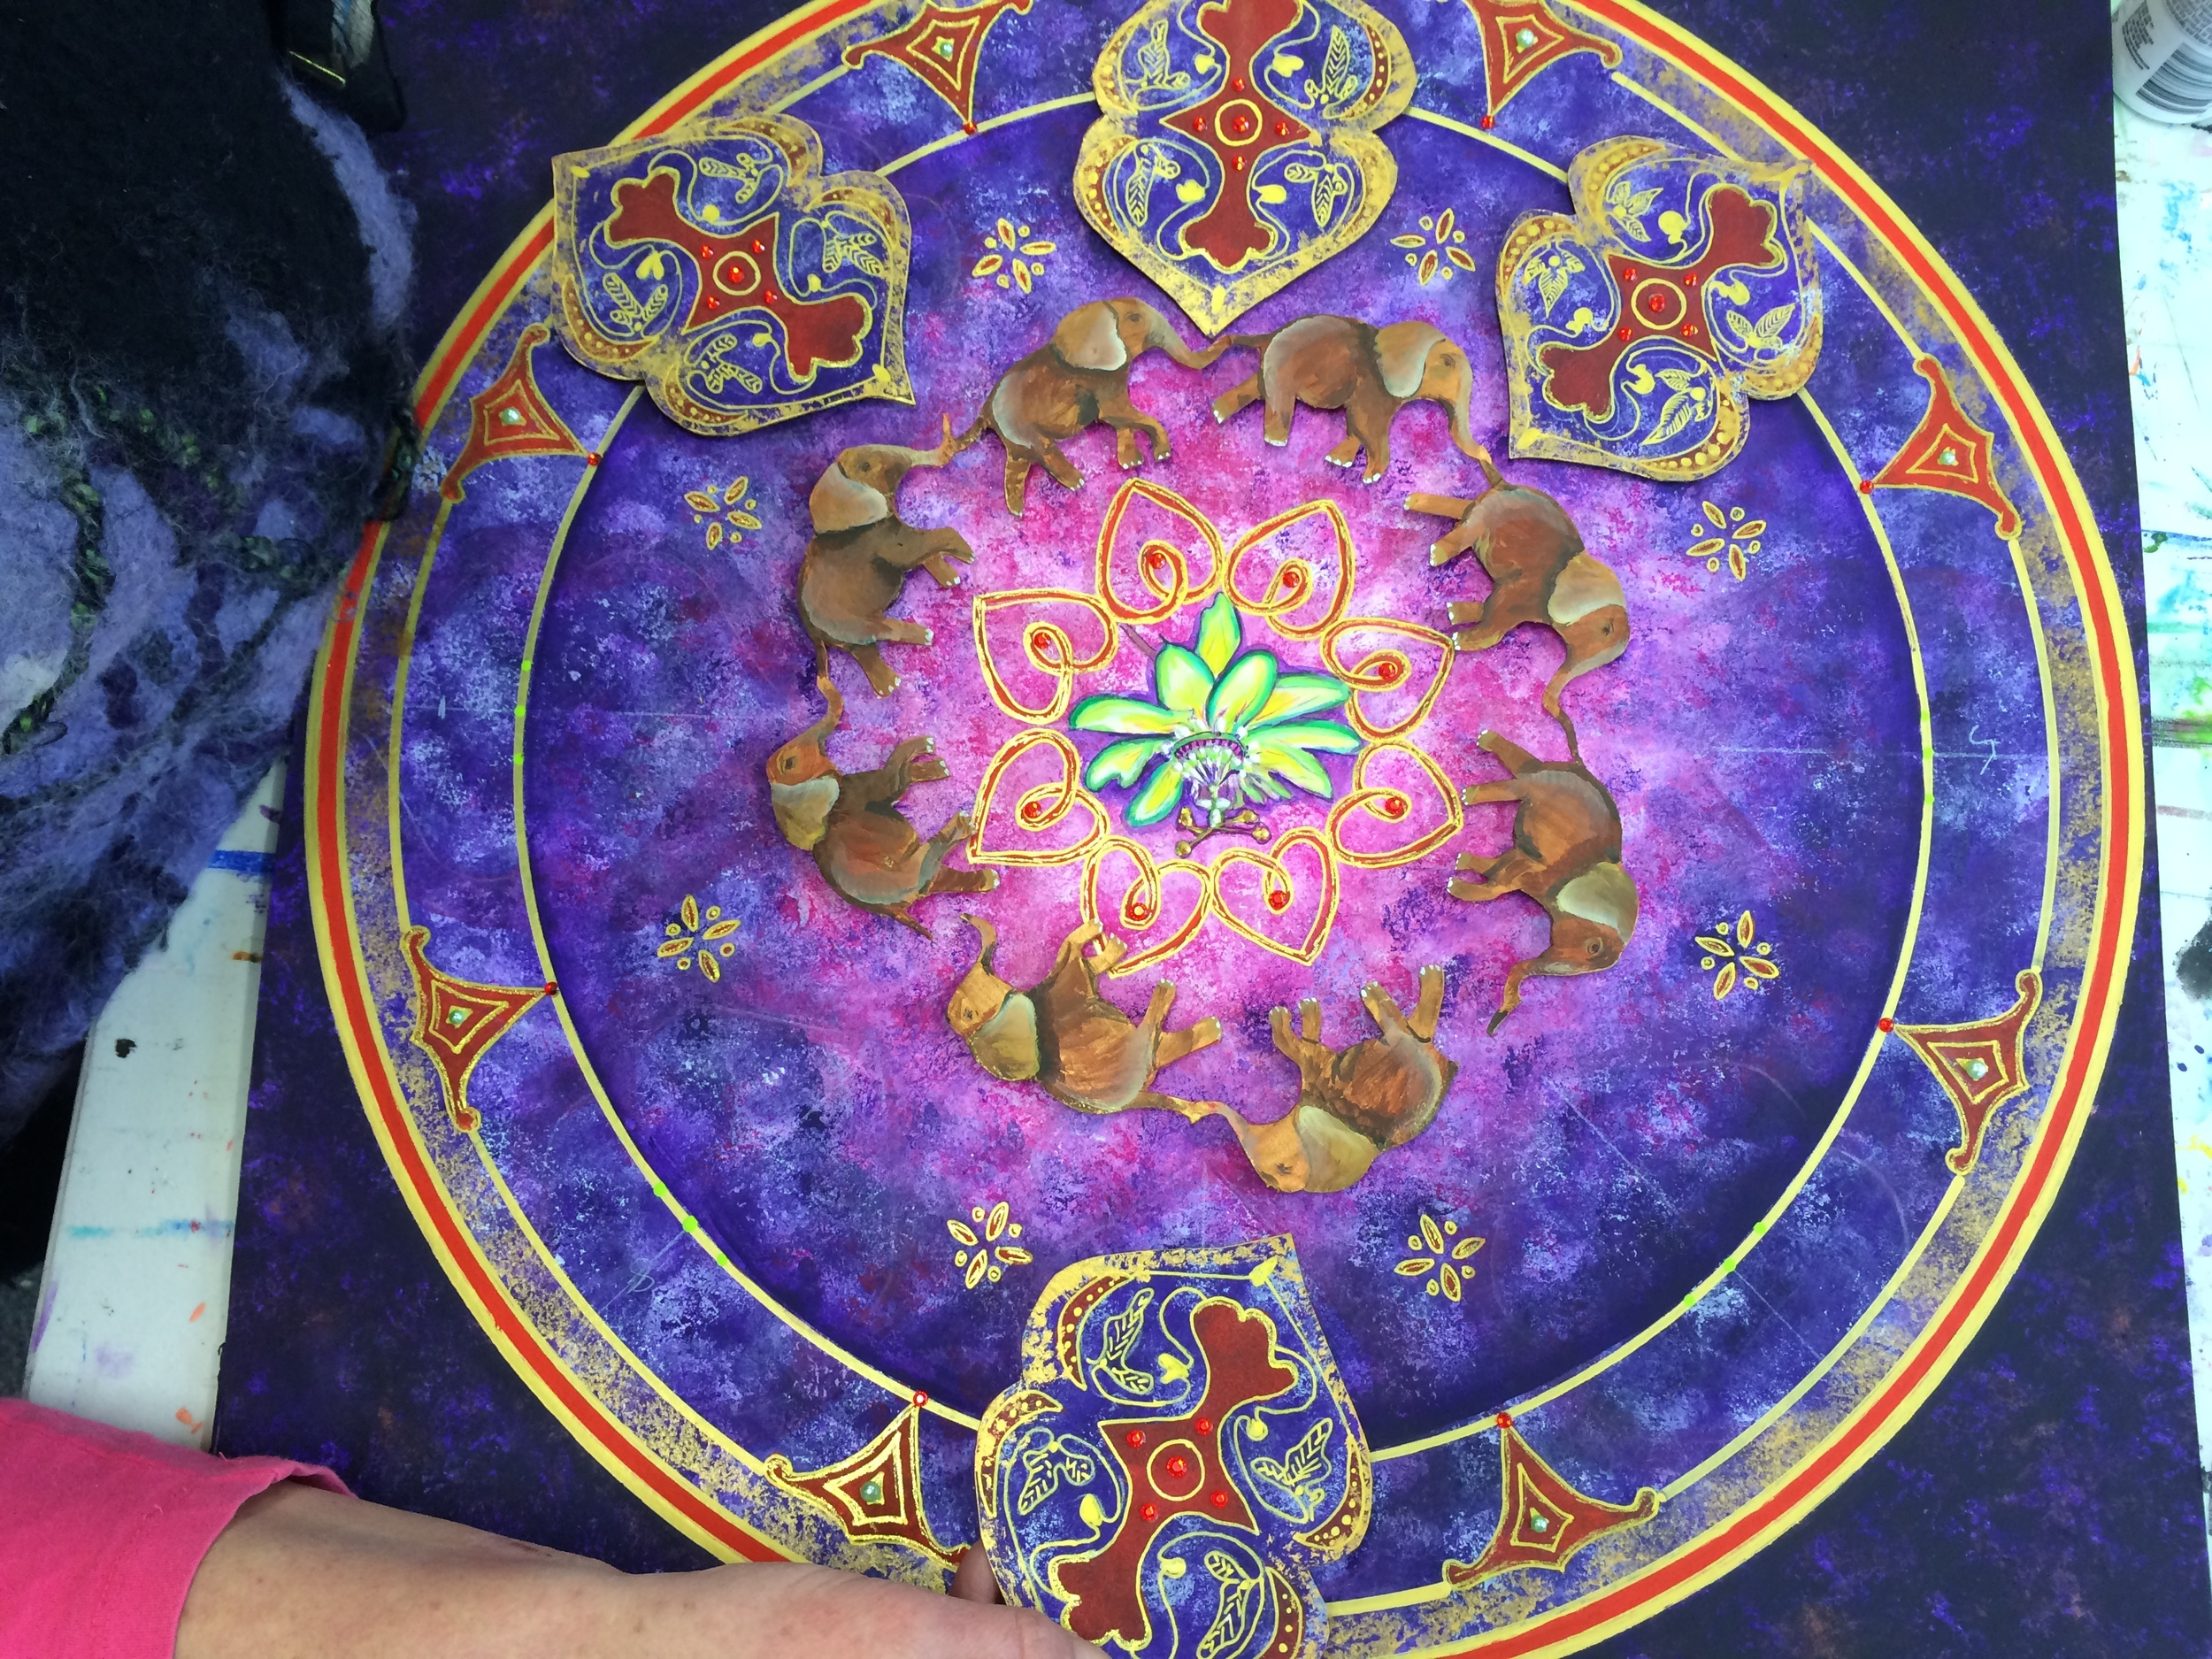 Tiffany working on a mandala